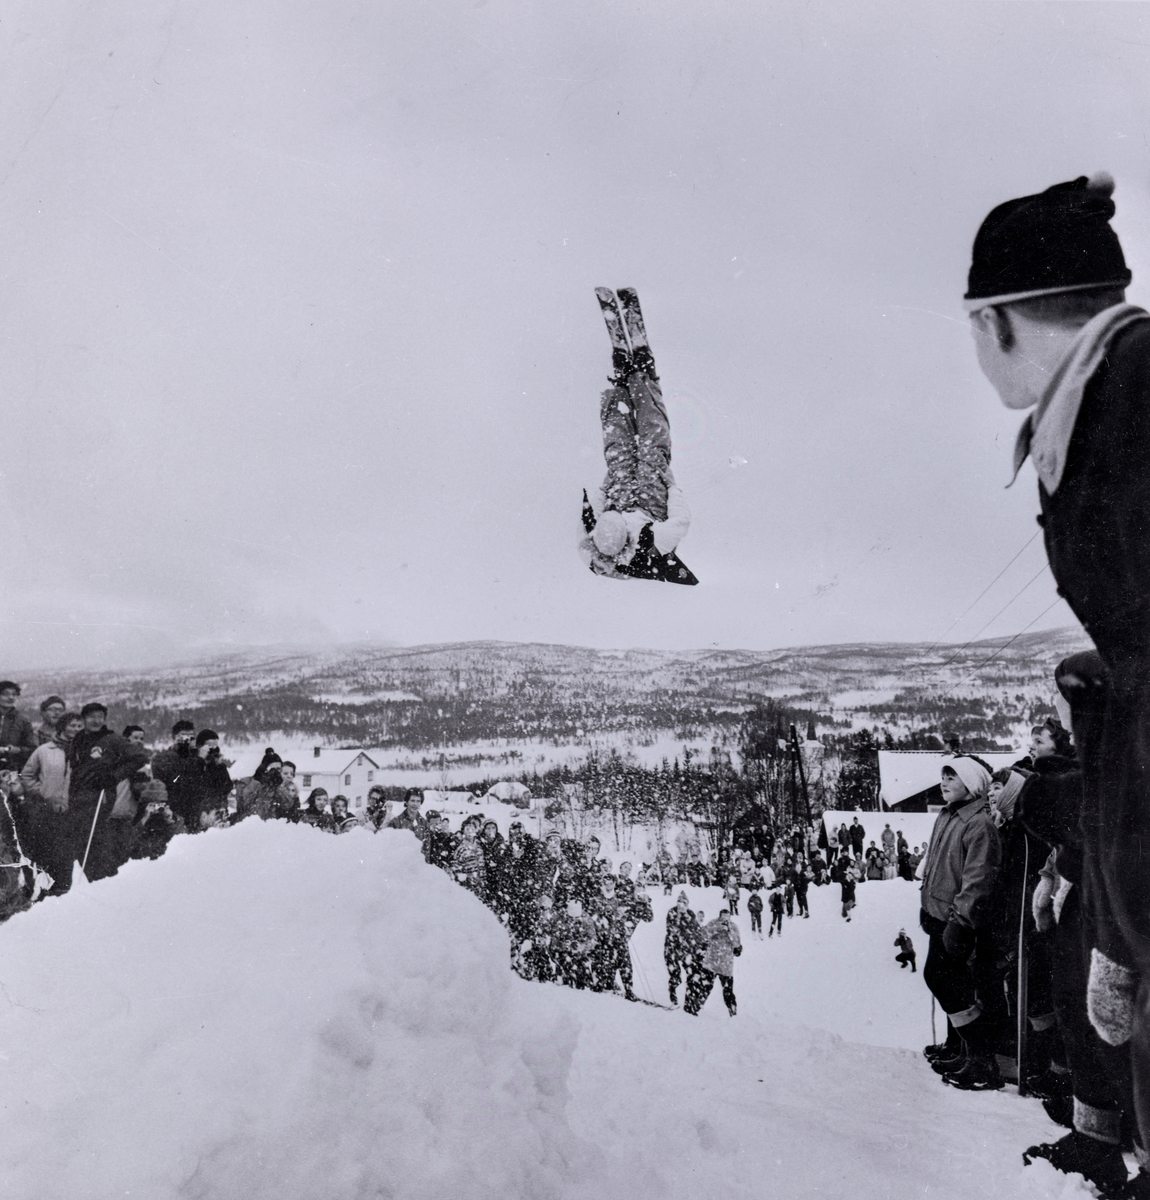 Kongsberg skier Birger Ruud doing a salto